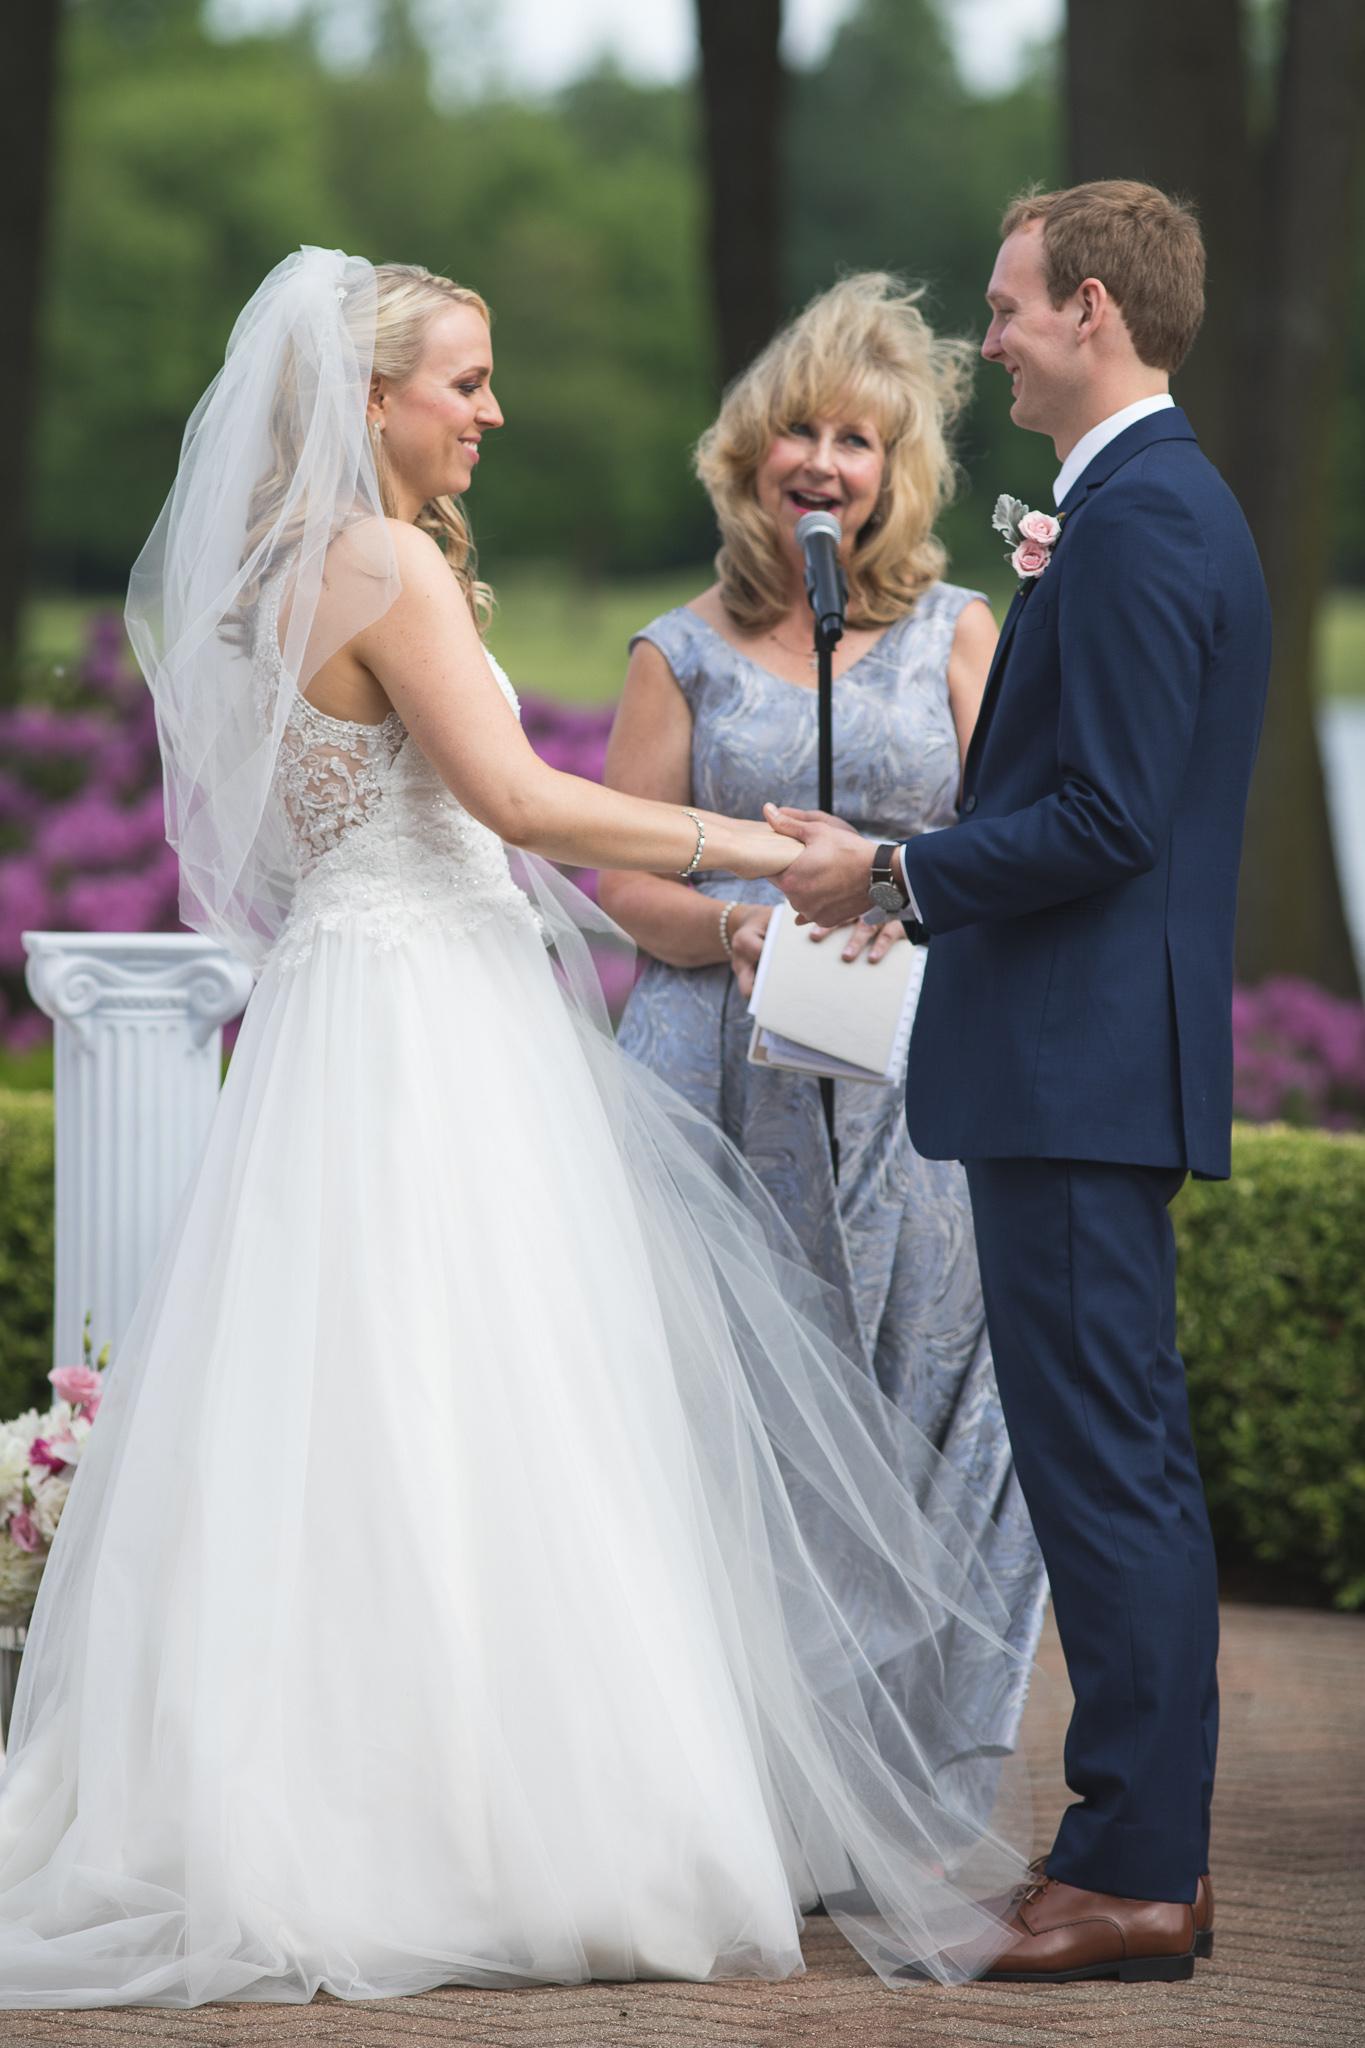 095-best-detroit-michigan-outdoor-wedding-photographer.jpg